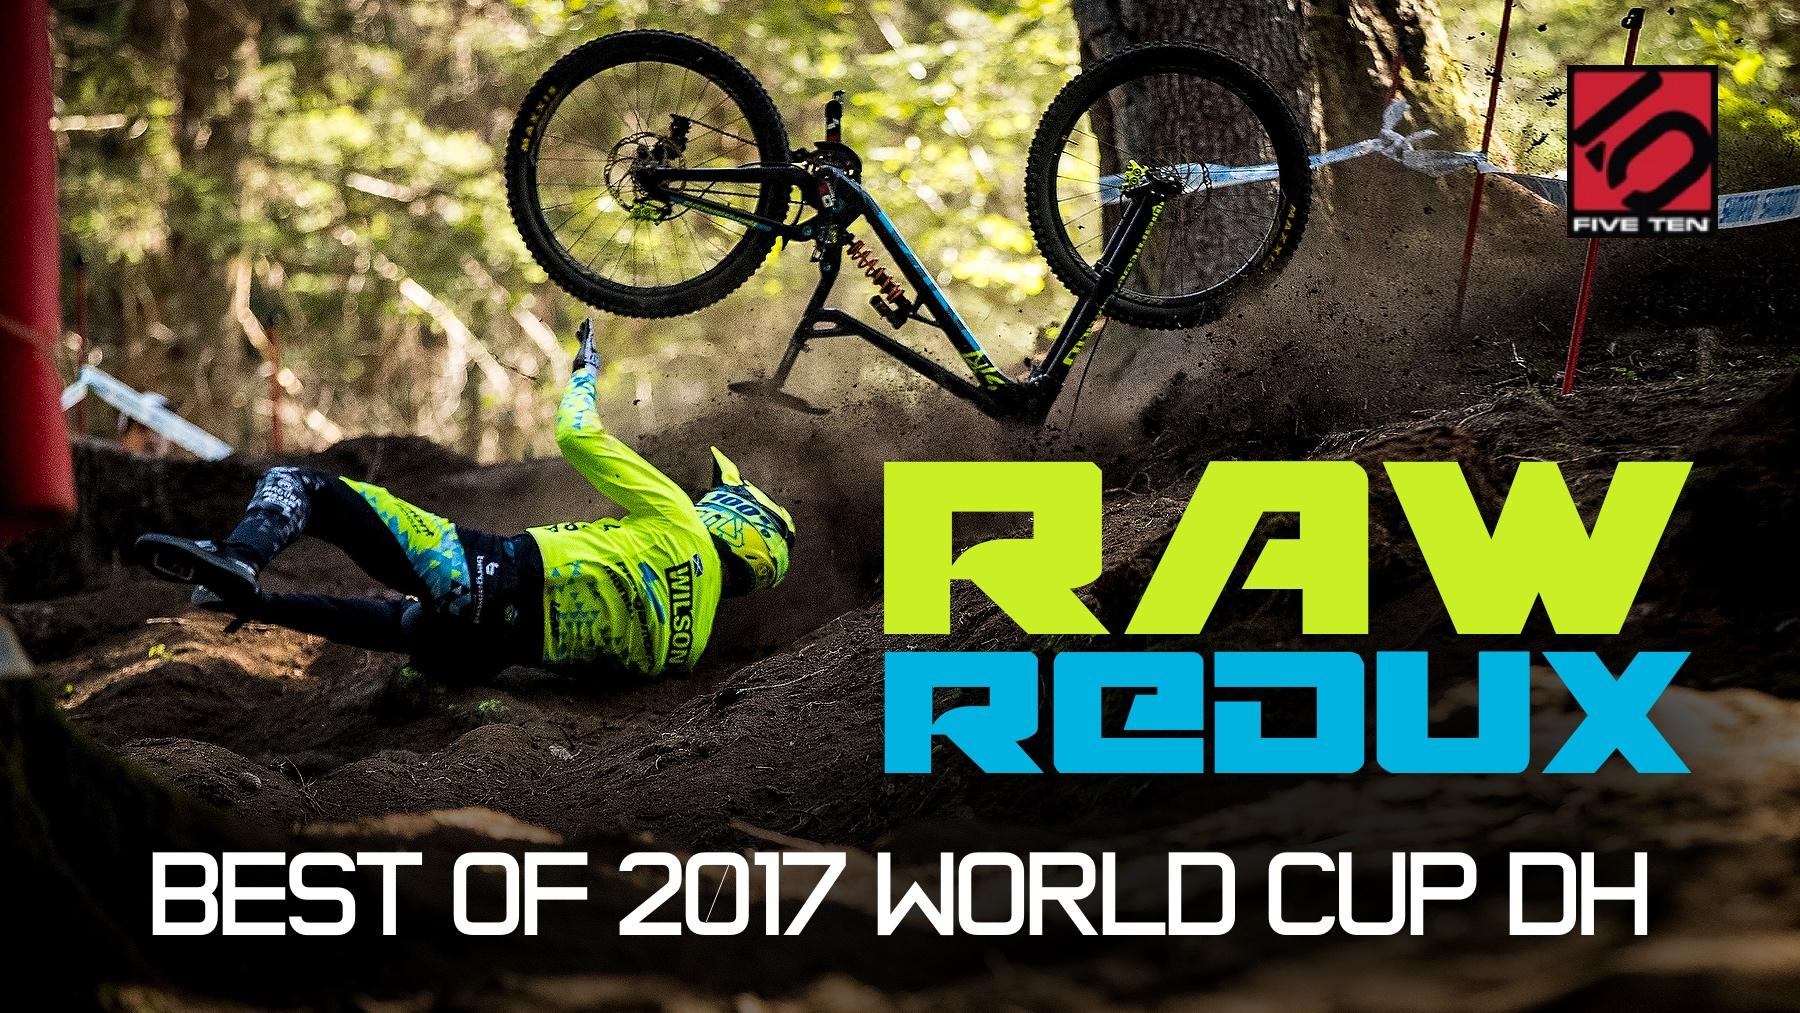 Vital RAW REDUX - Best of 2017 World Cup Downhill